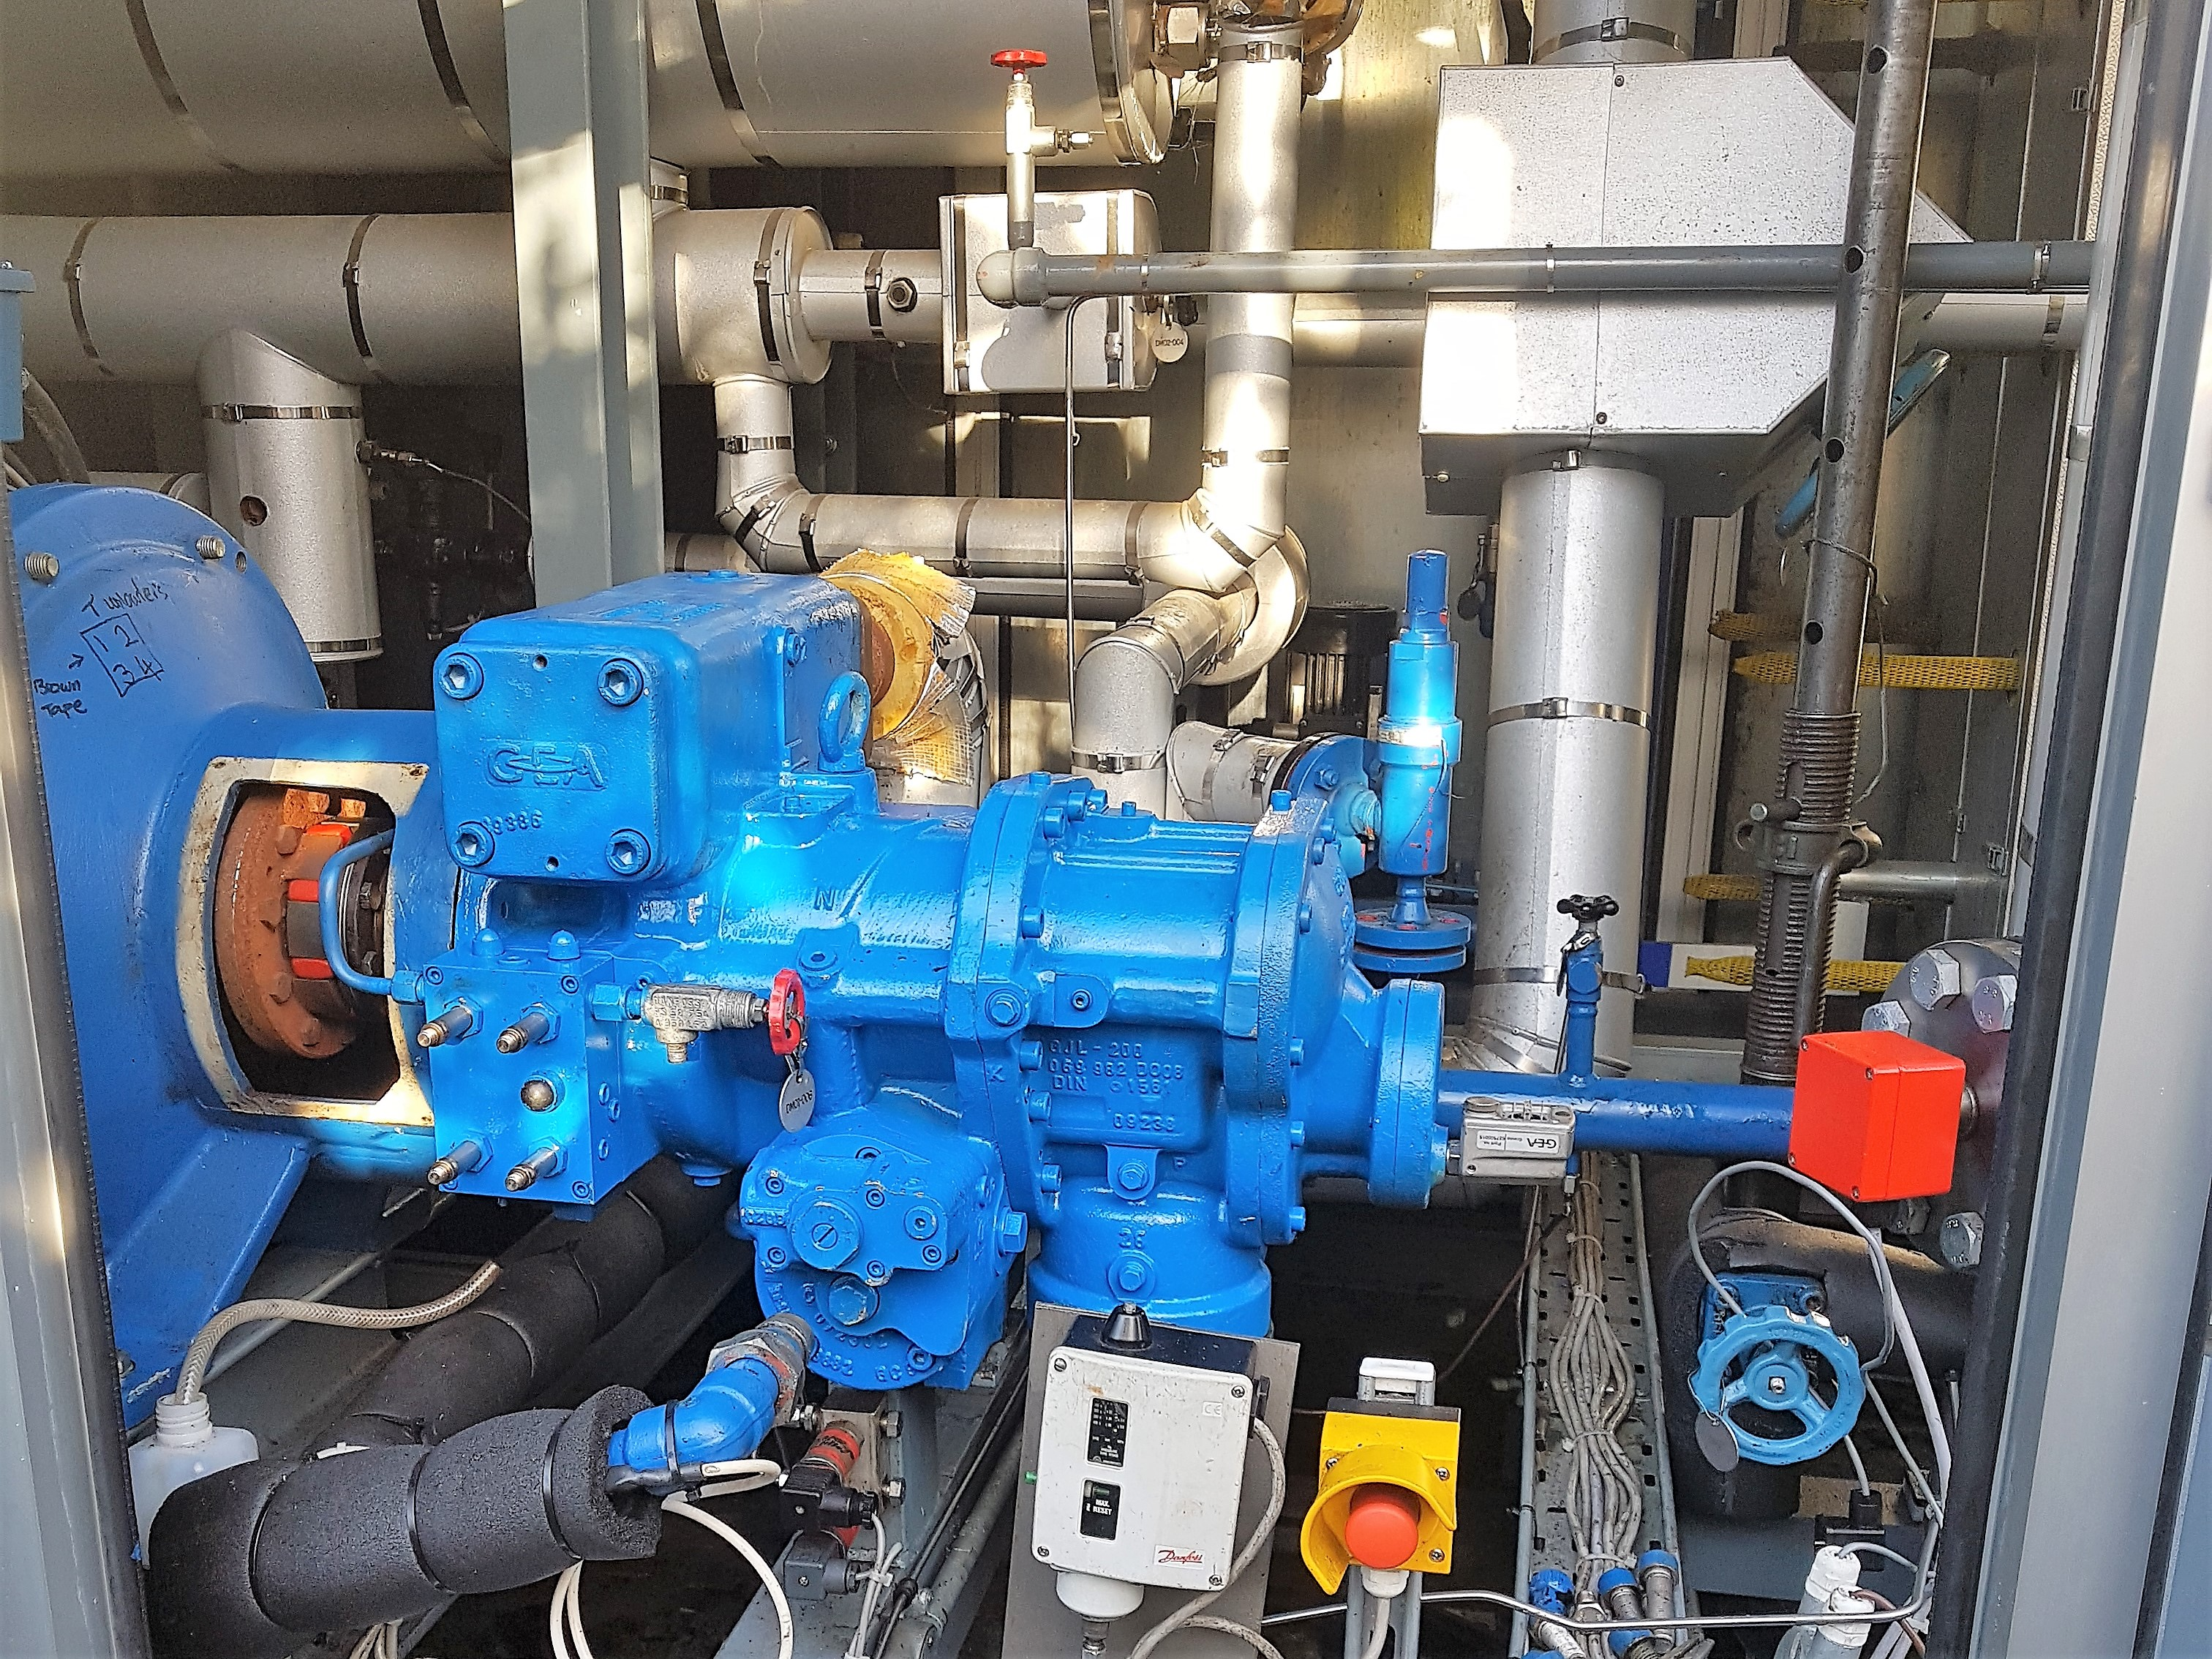 Compresor de frio industrial Grasso dentro de la enfriadora que se está preparando para ser levantado